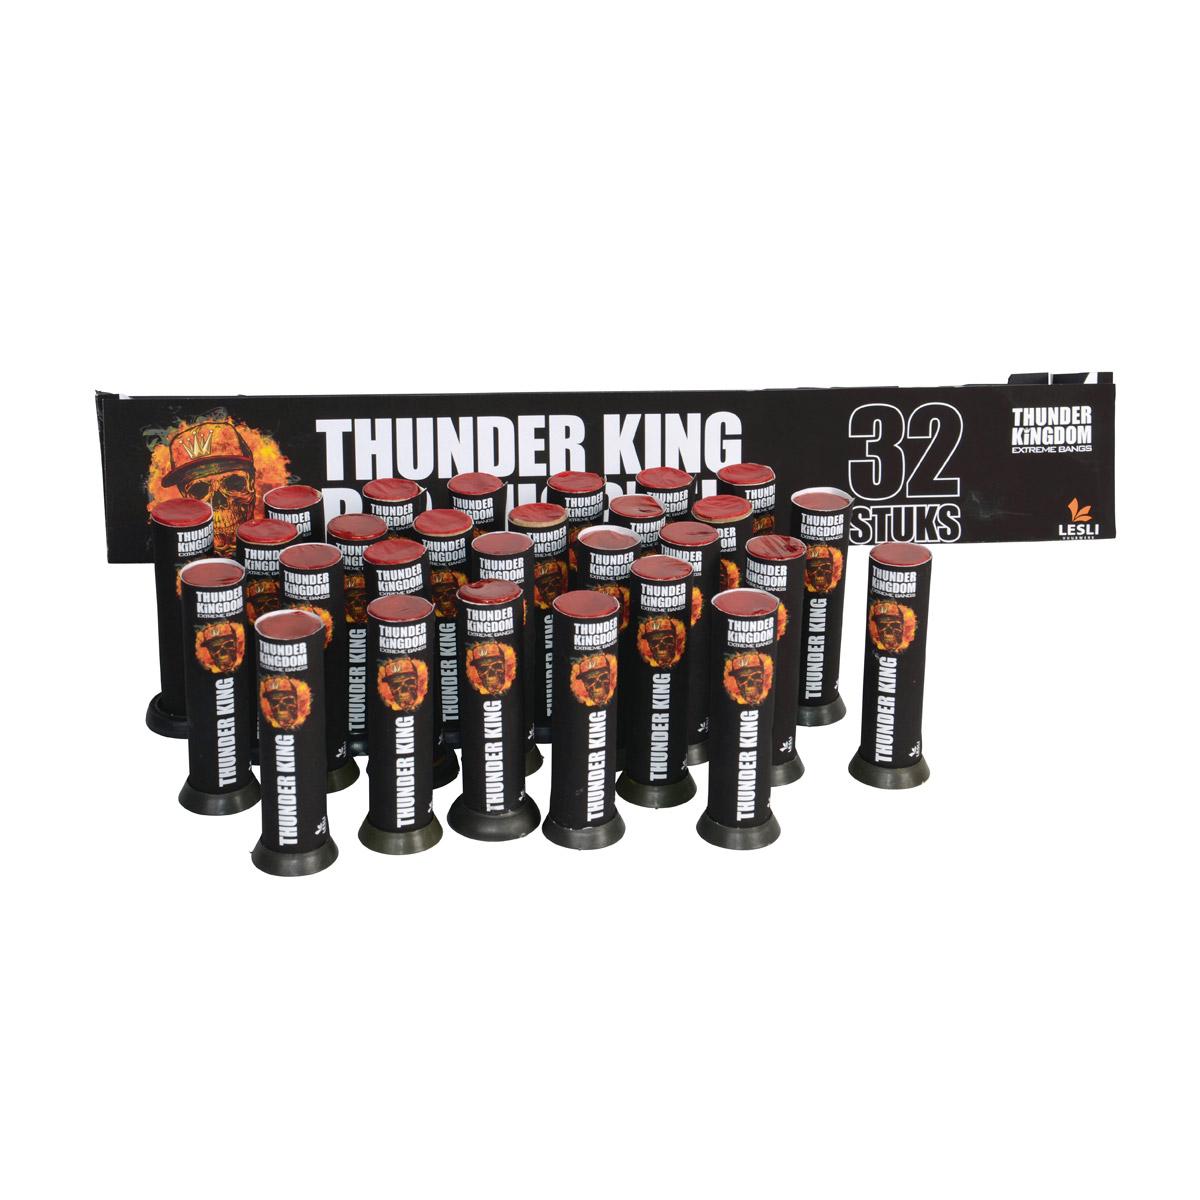 Thunderking Grootverpakking p/32